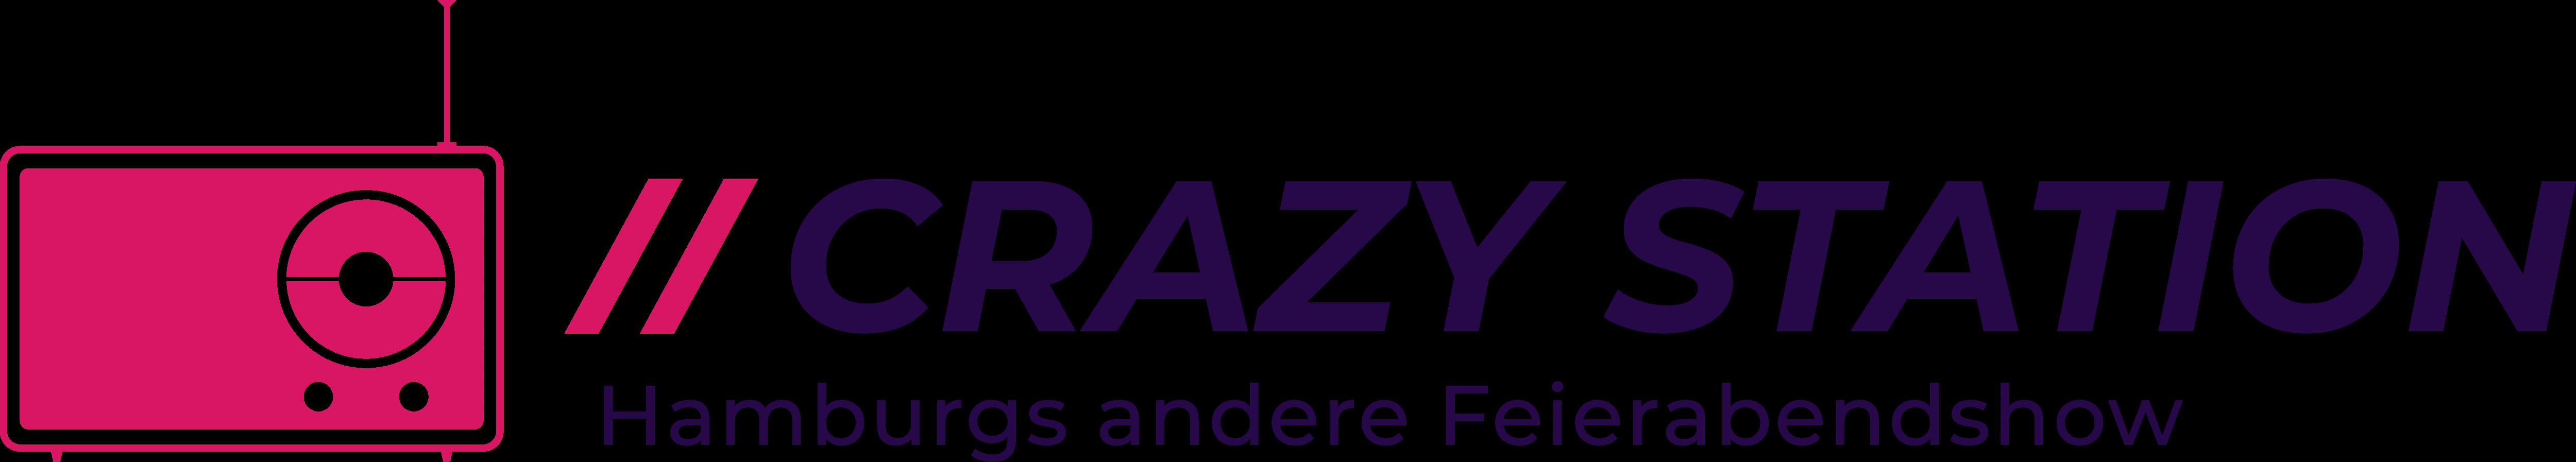 Crazy Station